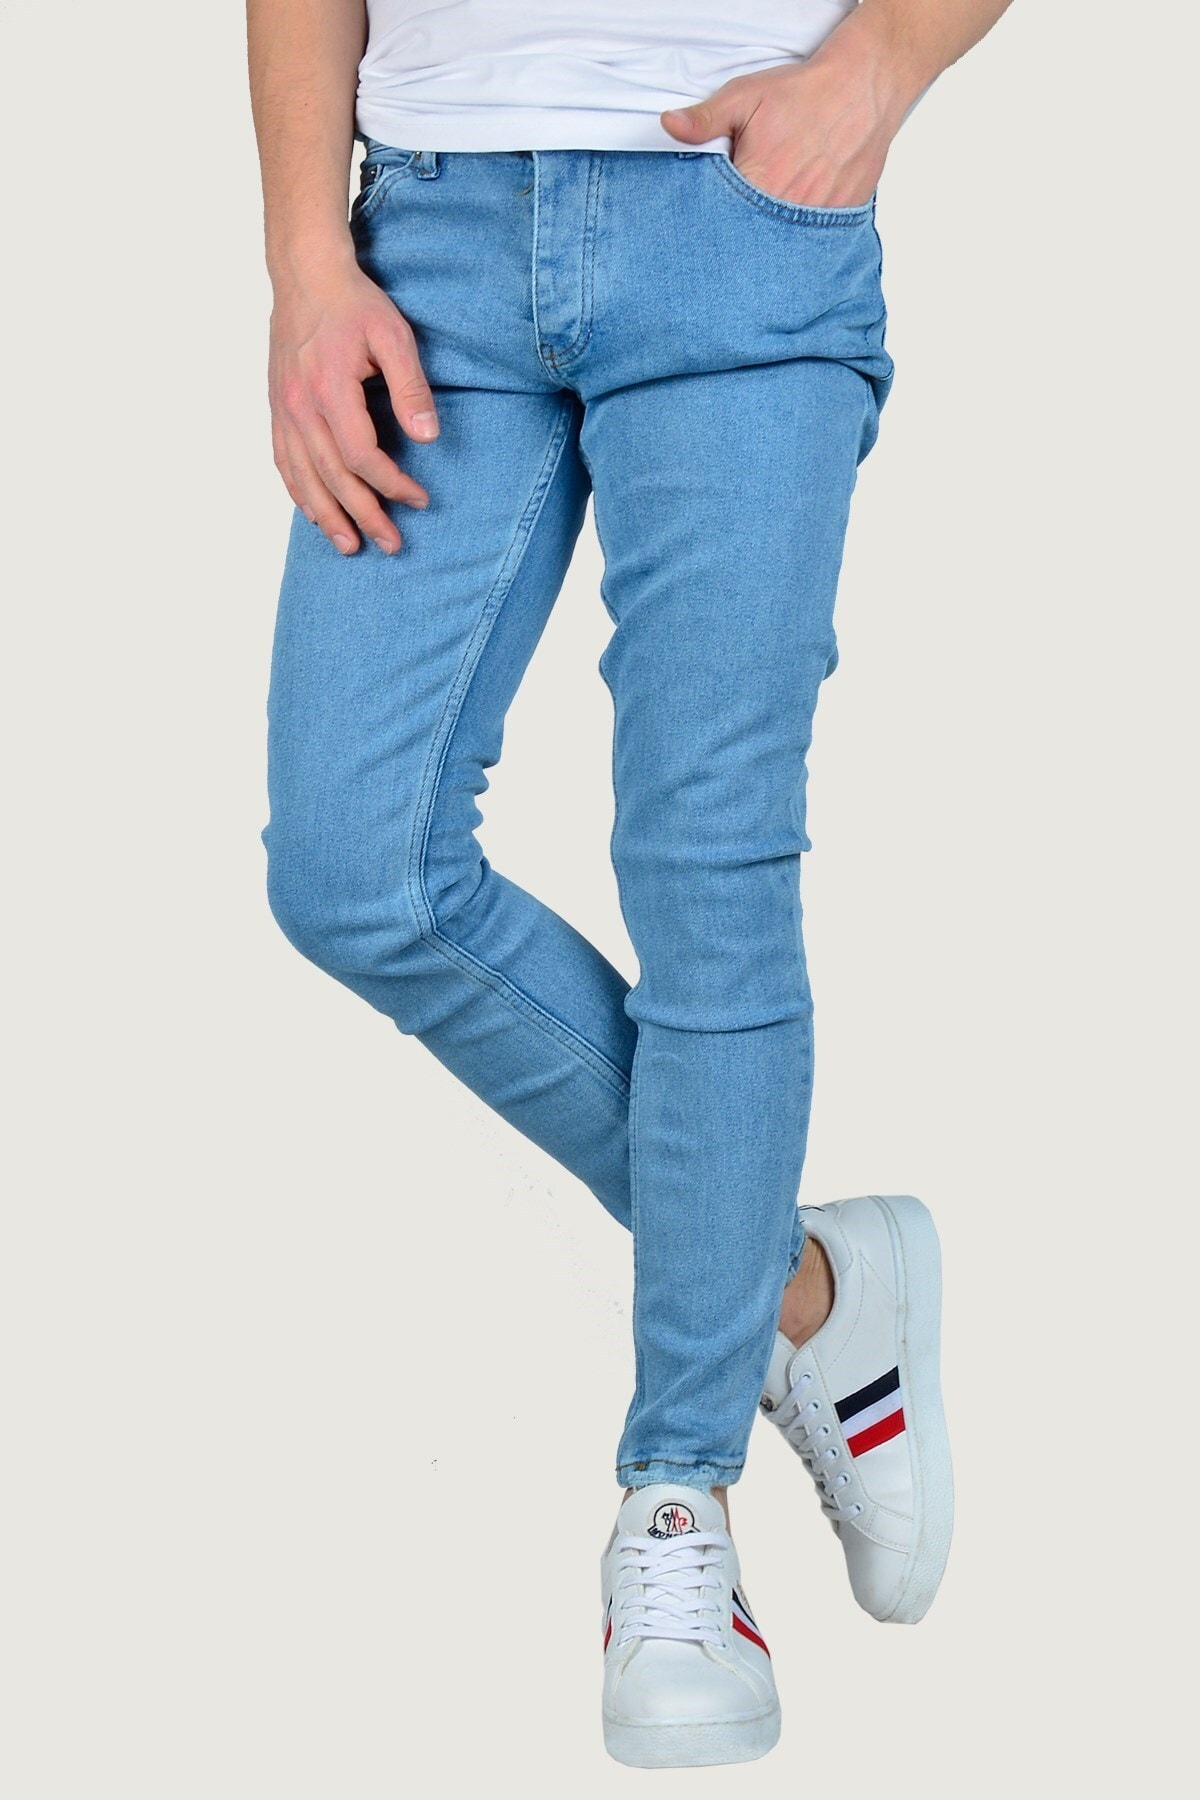 Terapi Men Erkek Kot Pantolon 9K-2100320-011 Buz Mavisi 0